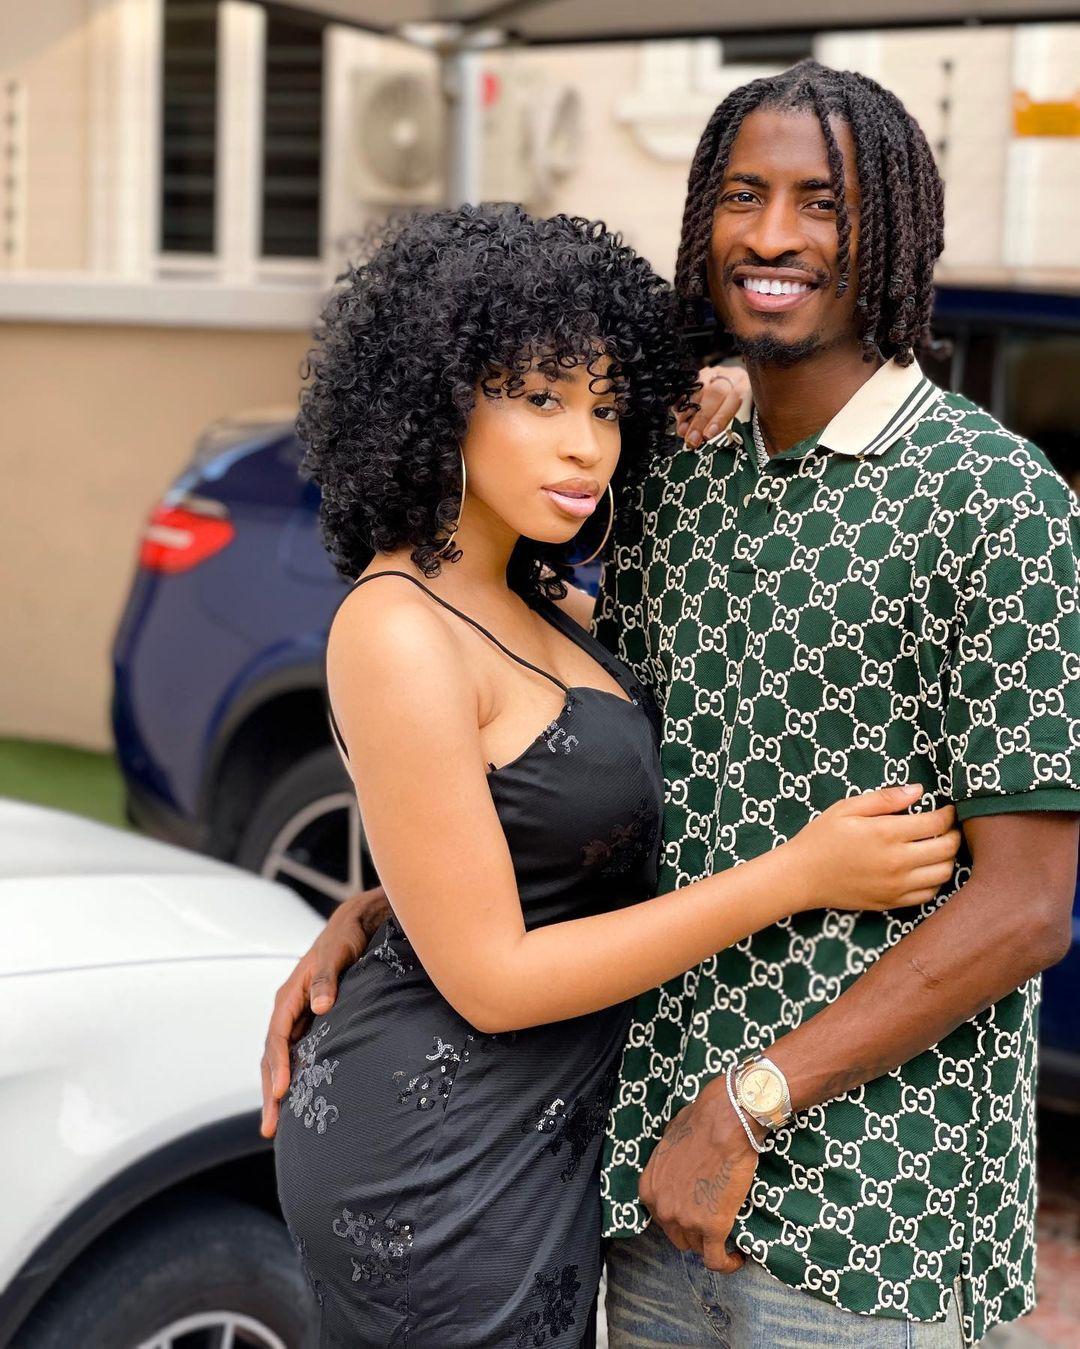 Peter Olayinka and his fiancée, actress Yetunde Barnabas